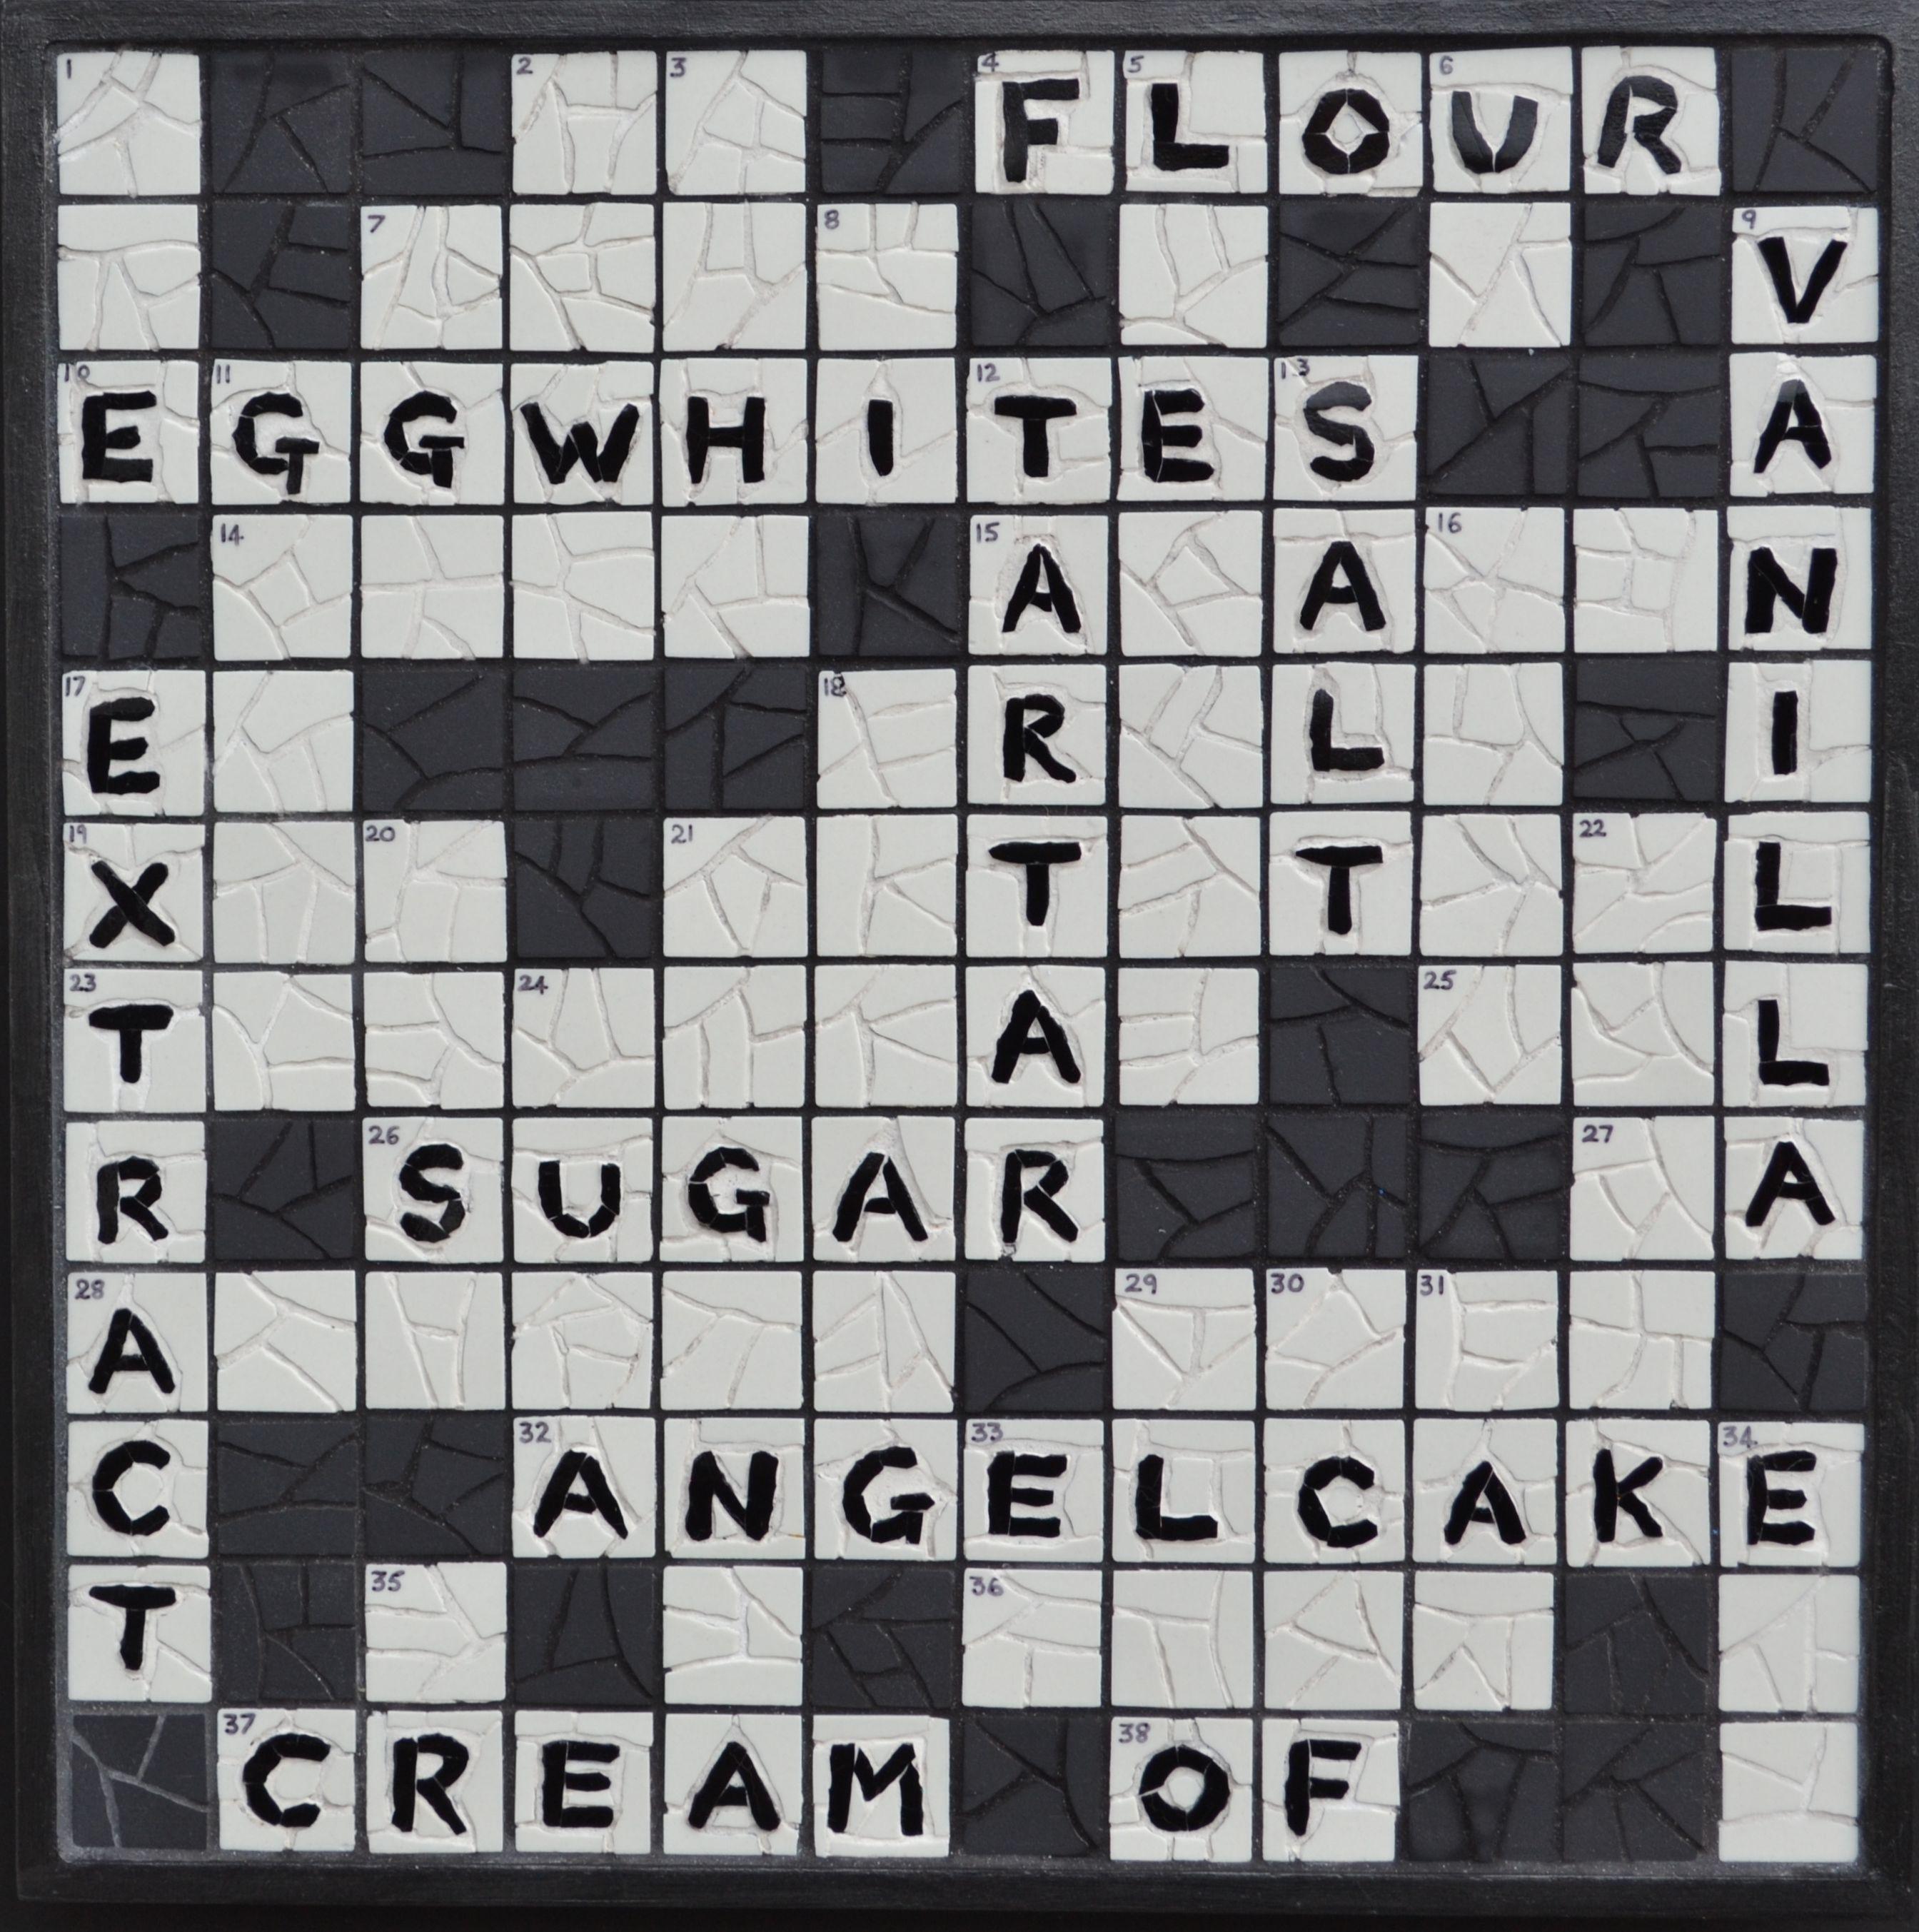 Angel cake crossword